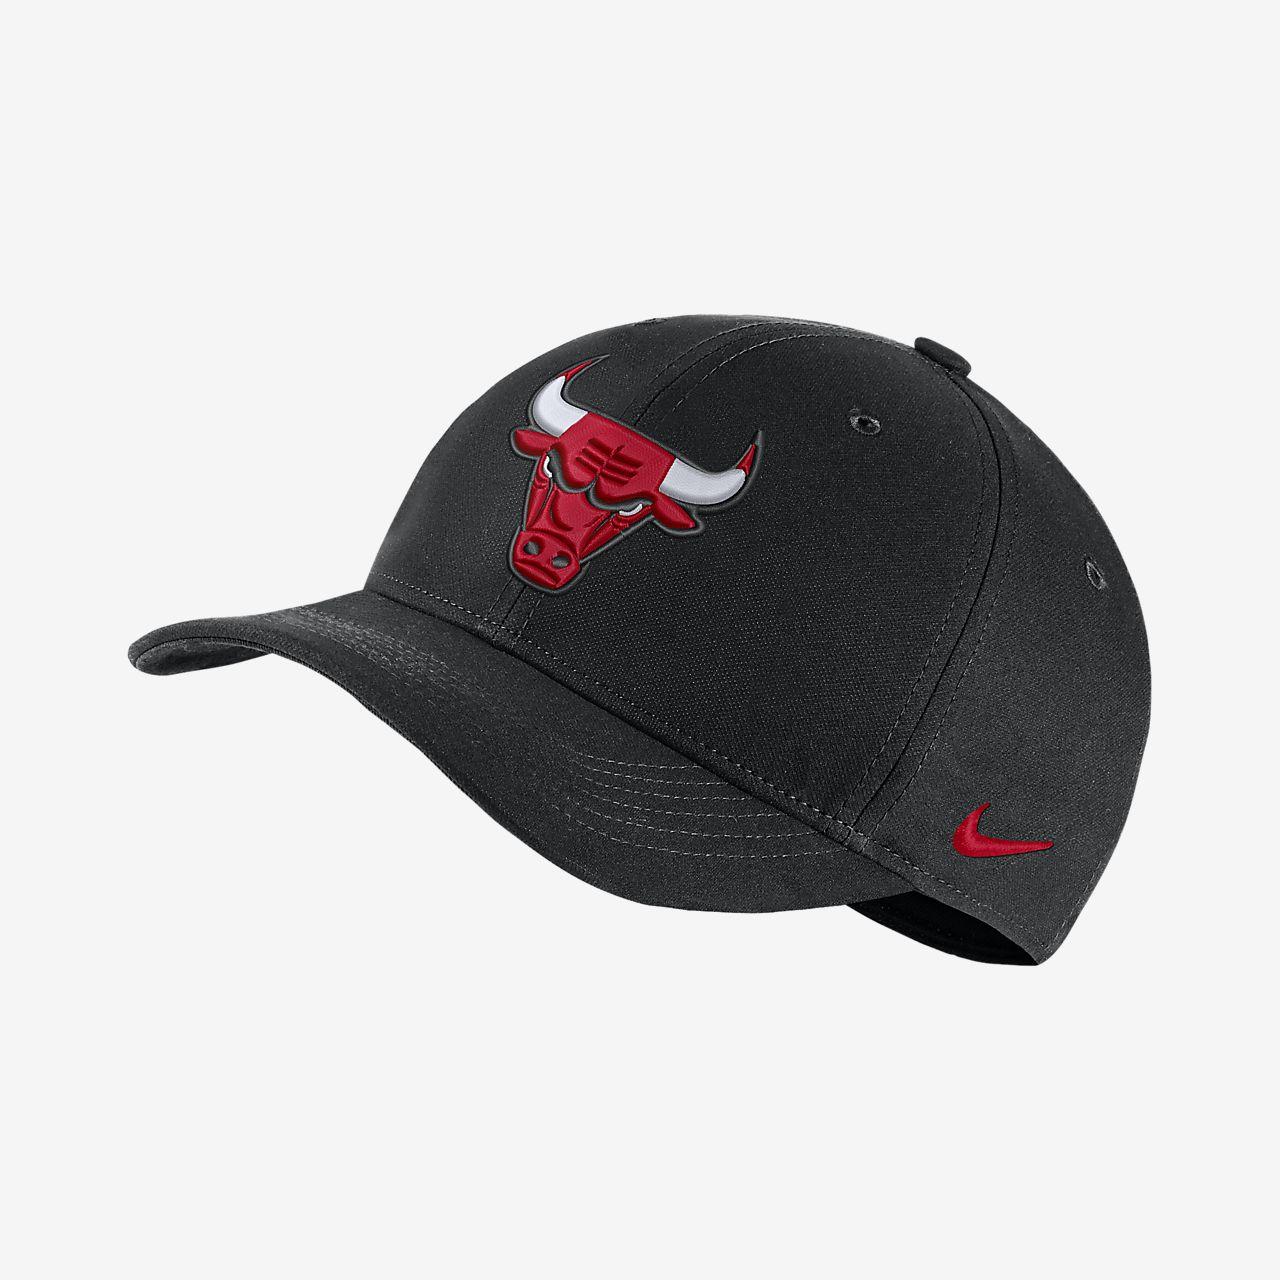 Casquette NBA Chicago Bulls City Edition Nike AeroBill Classic99